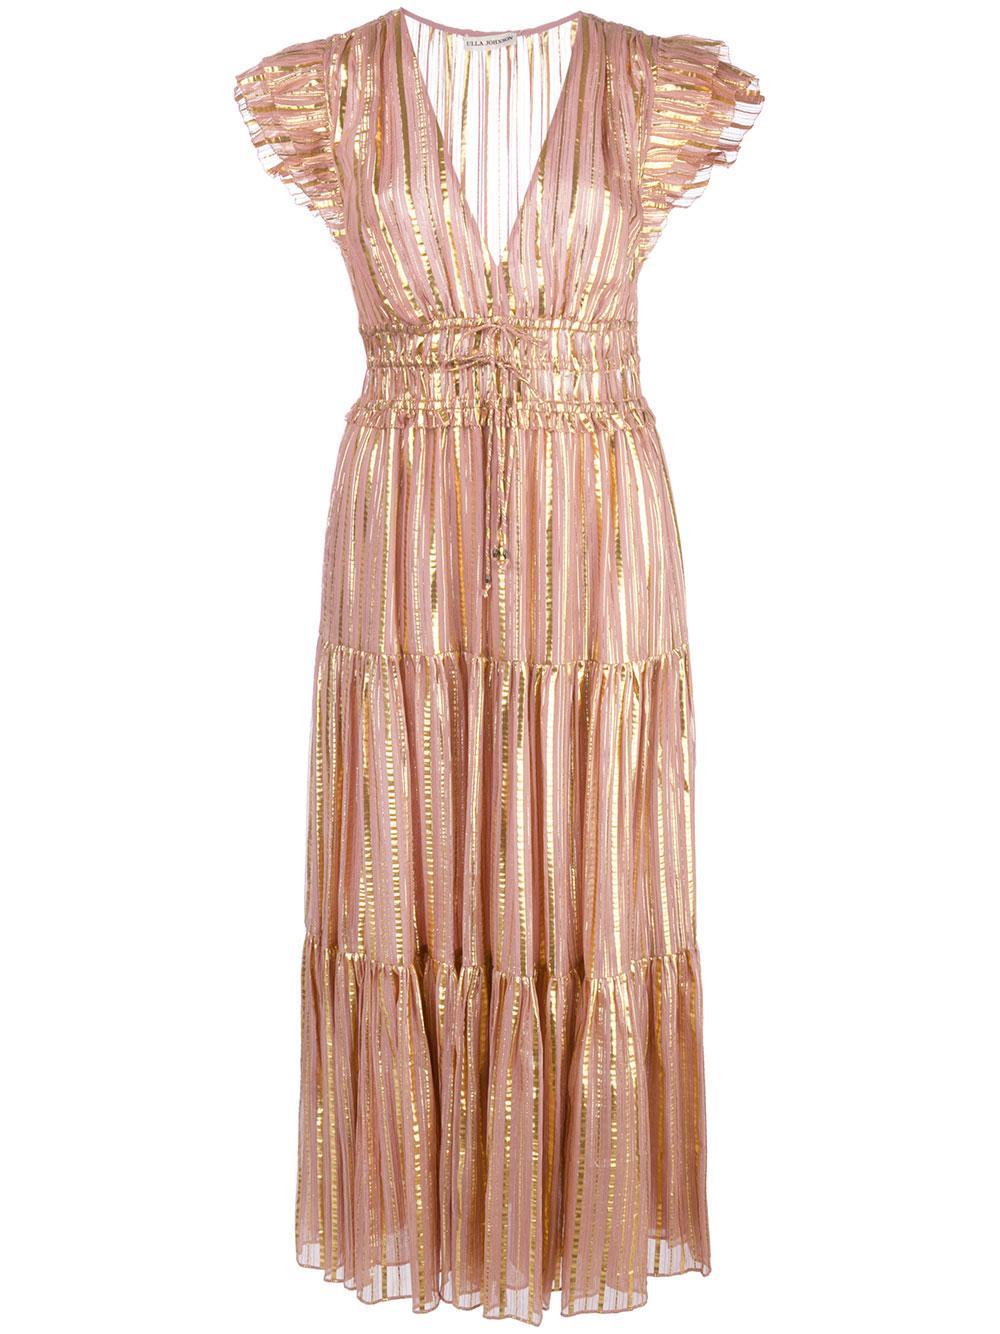 Justyne Gilded Lurex Stripe Midi Dress Item # HO190105